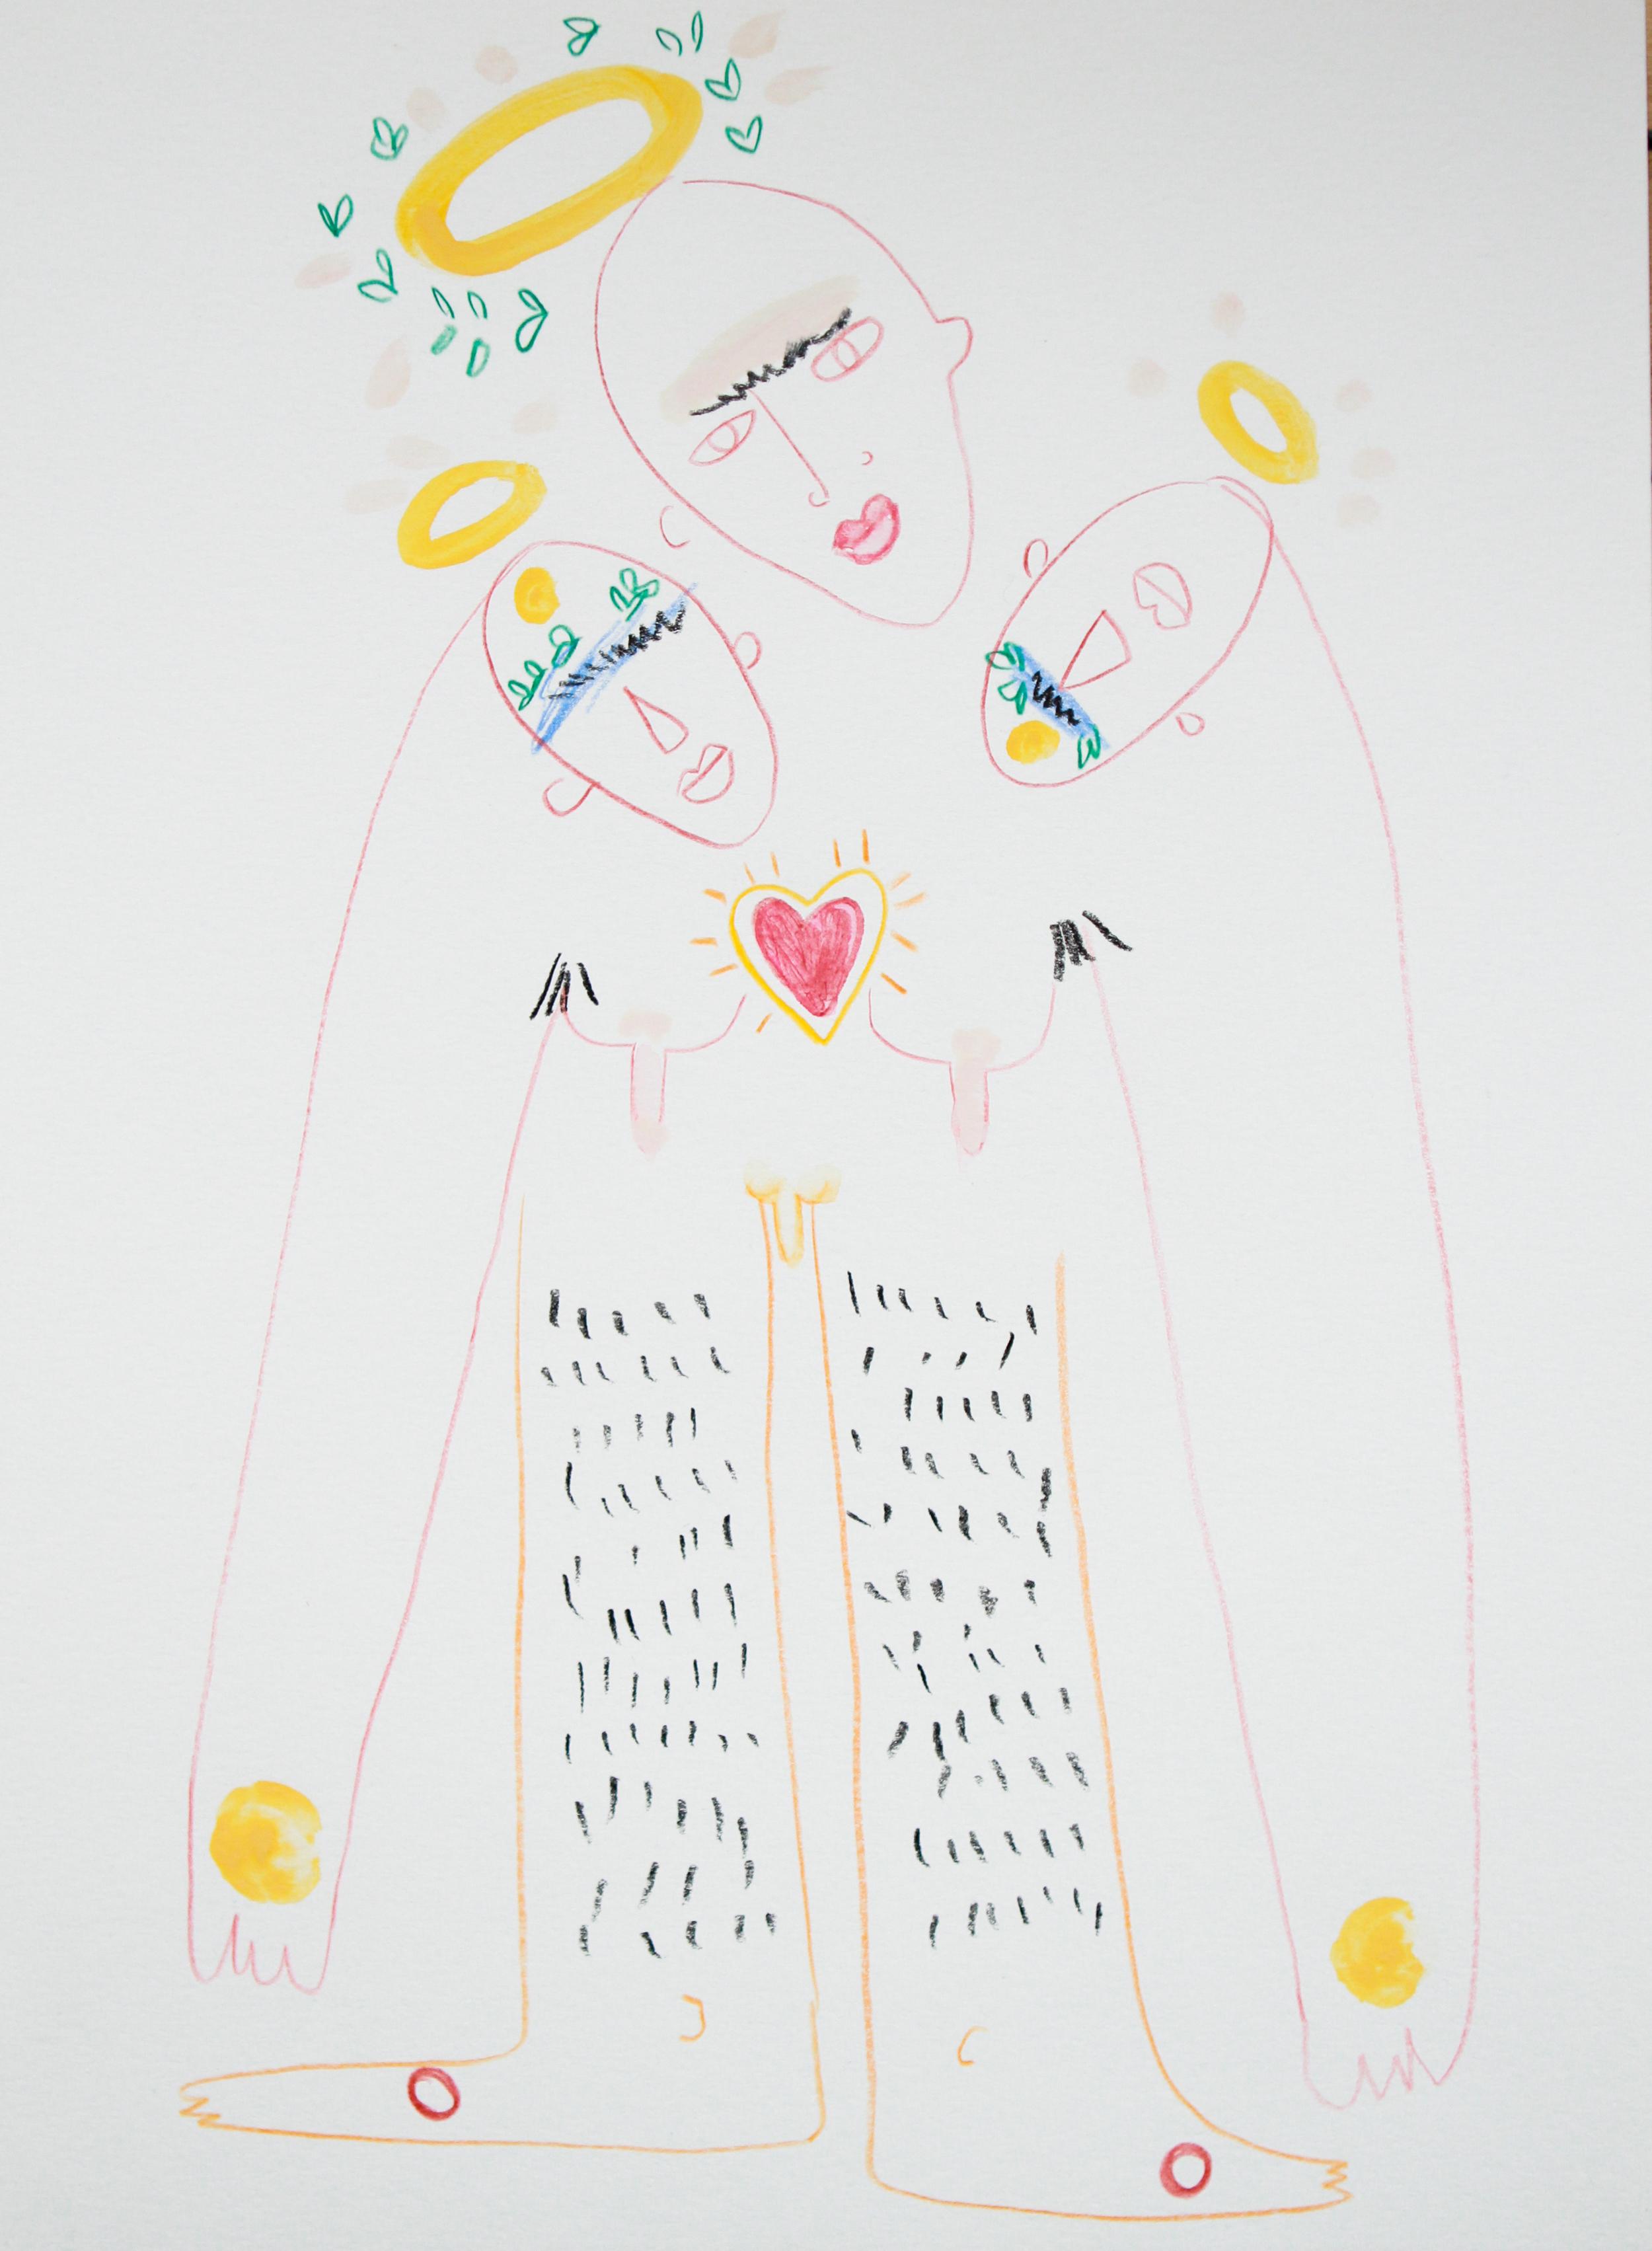 Marie Ségolène C. Brault,  Untitled , 2015